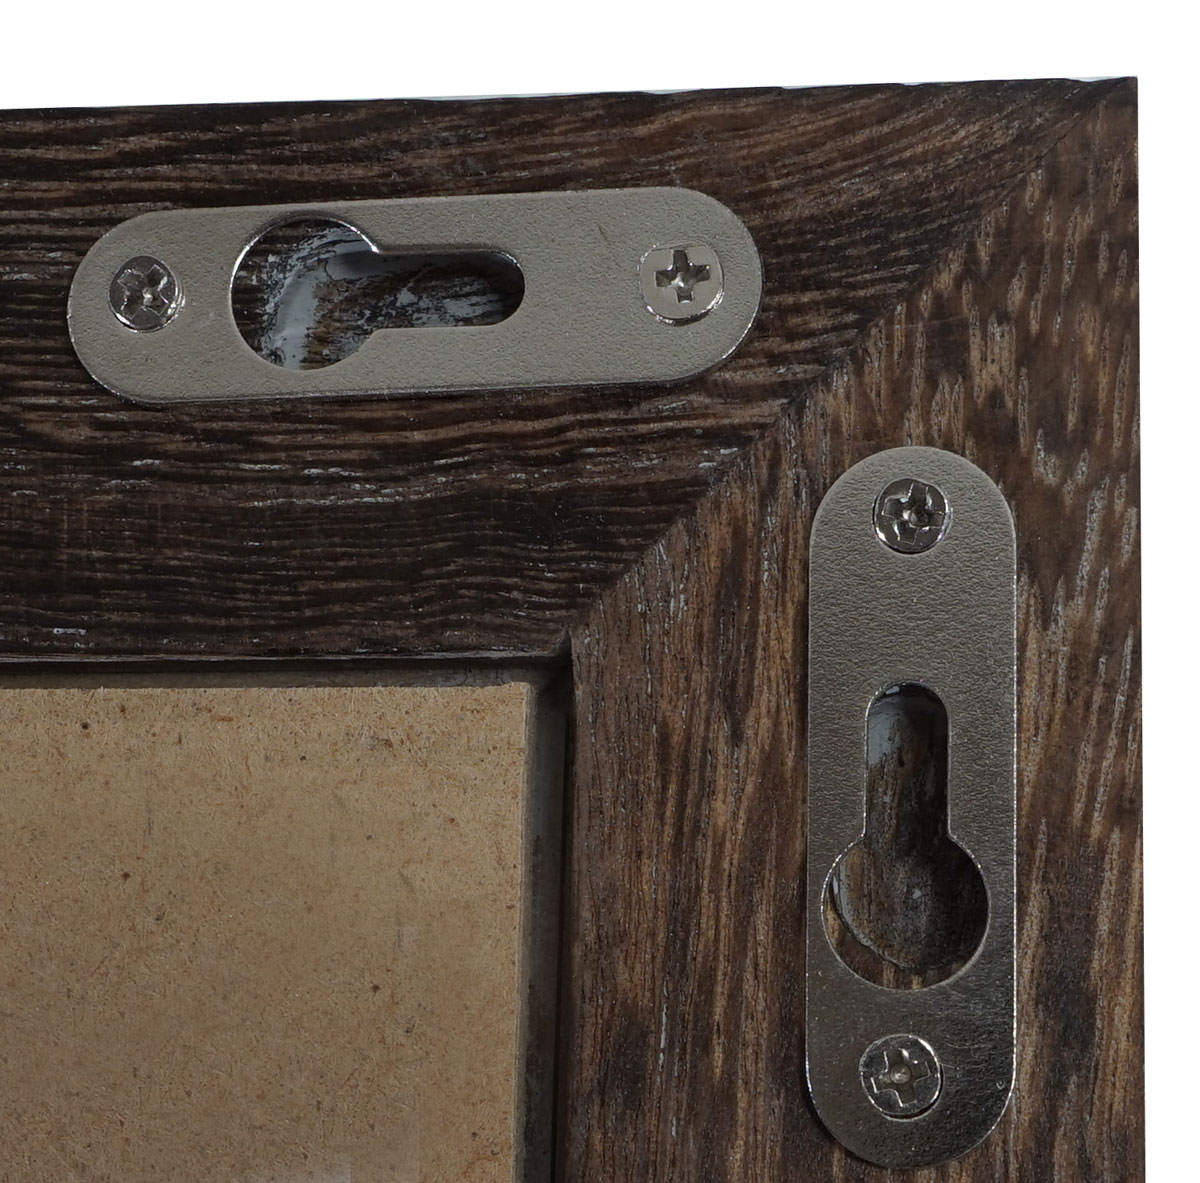 shabby chic bilderrahmen t248 fotorahmen holzrahmen 36x51cm braun. Black Bedroom Furniture Sets. Home Design Ideas